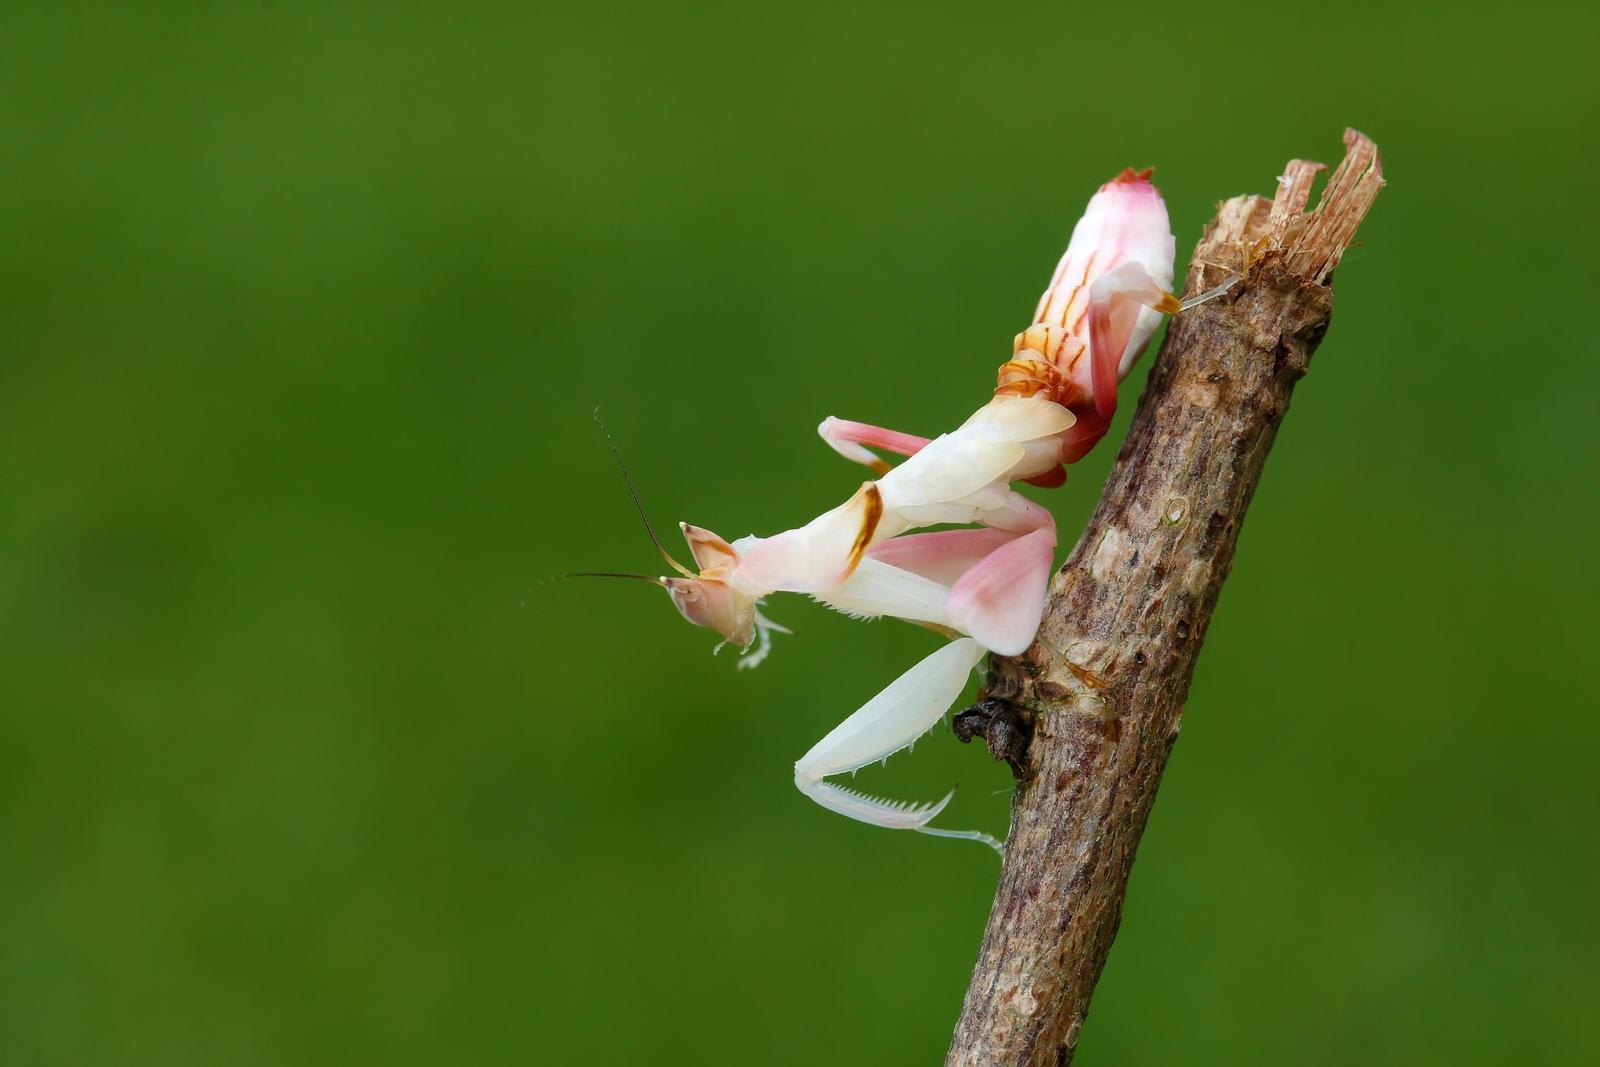 orhid mantis